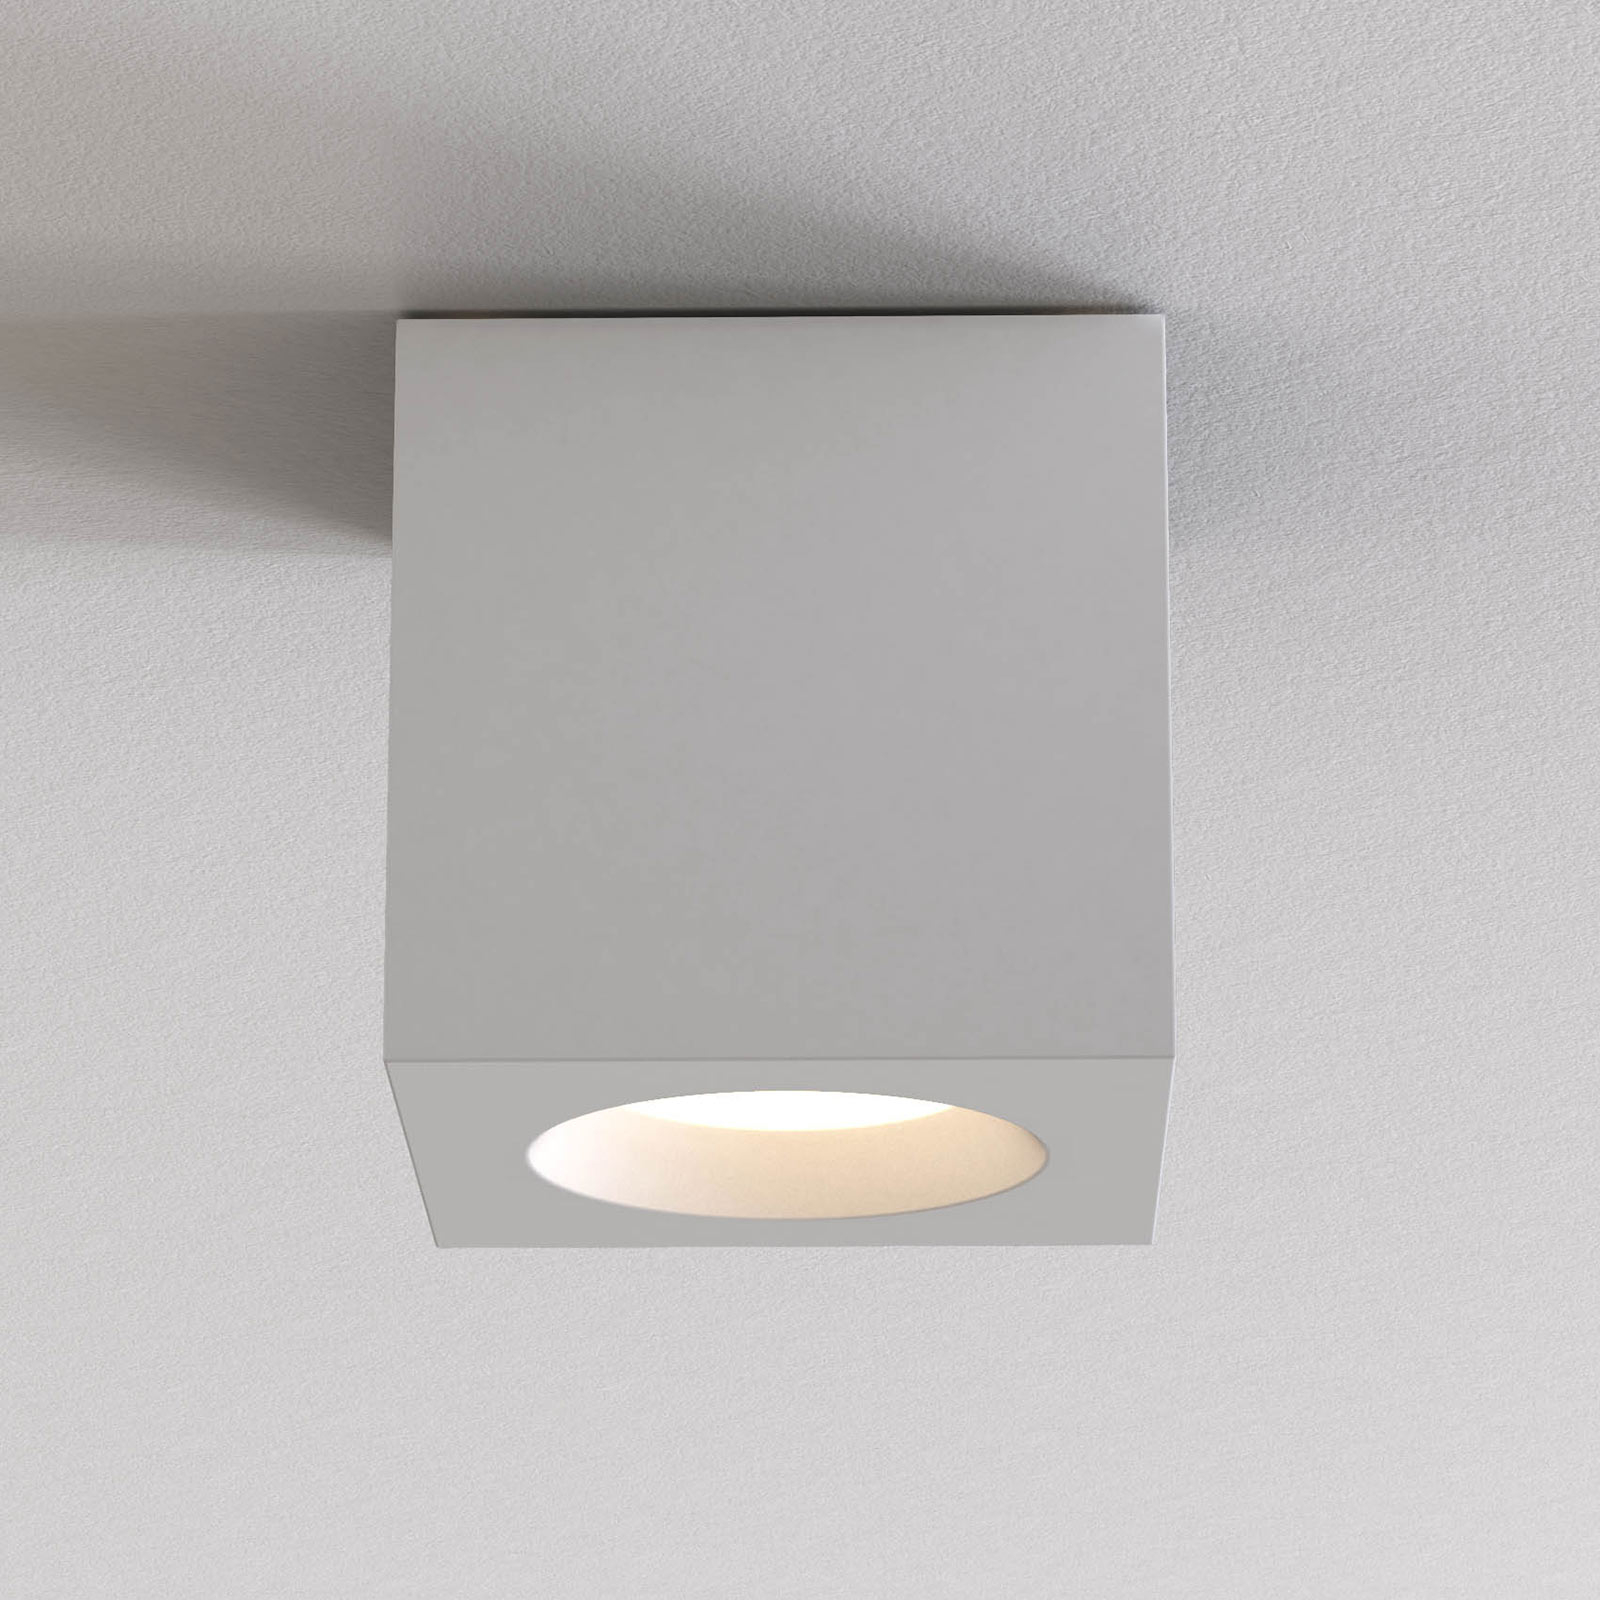 Astro Kos Square II taklampe, matt hvit